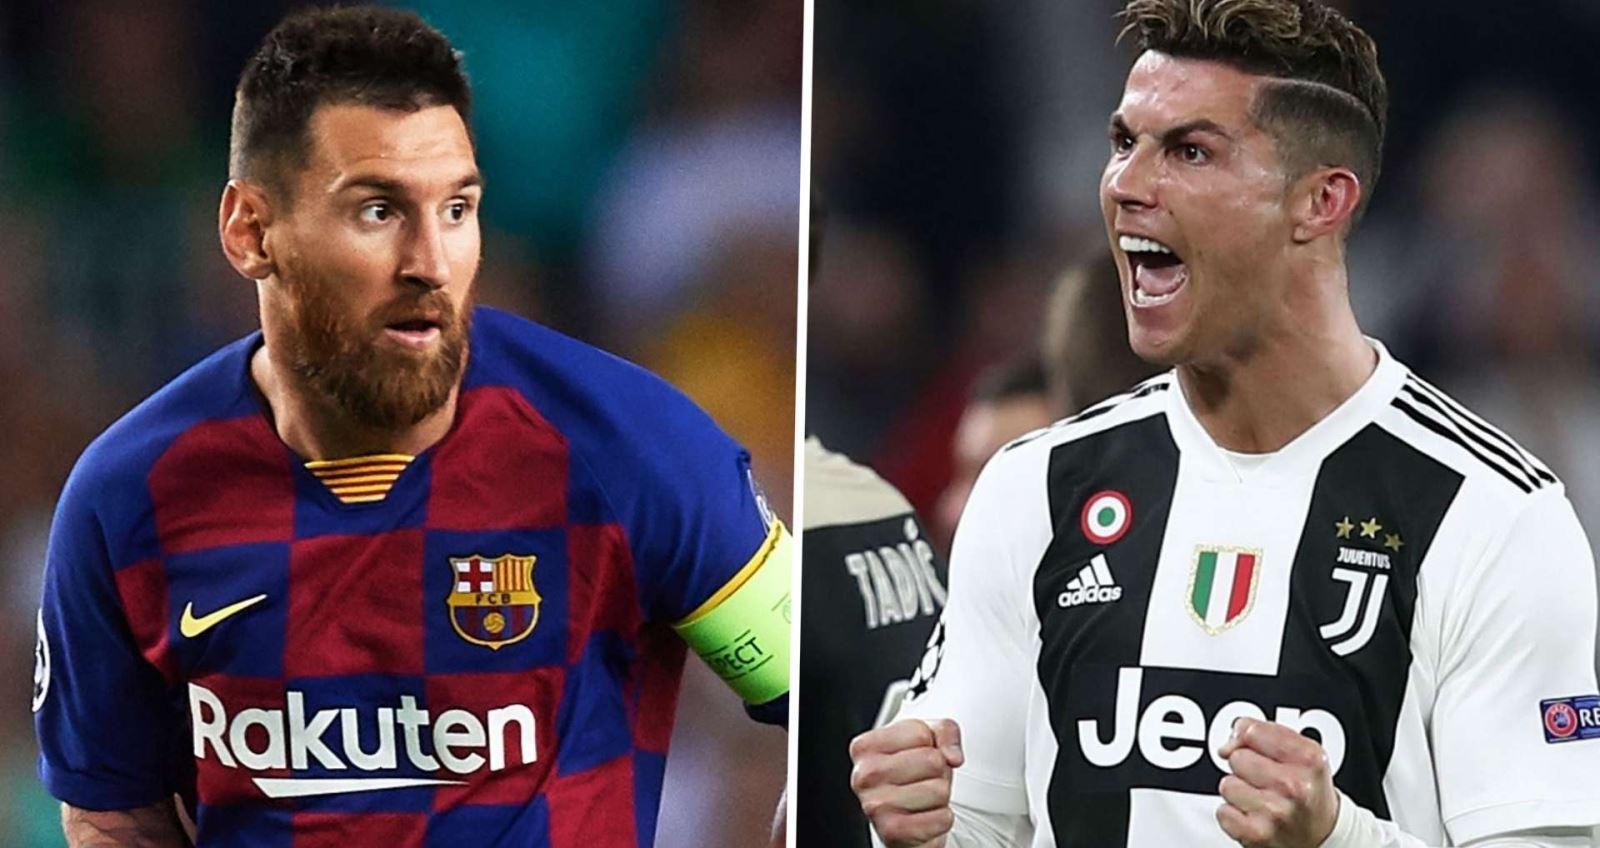 bóng đá, bong da, mu, manchester united, Sergio Reguilon, Juventus, Juve, Ronaldo, Messi, Barcelona